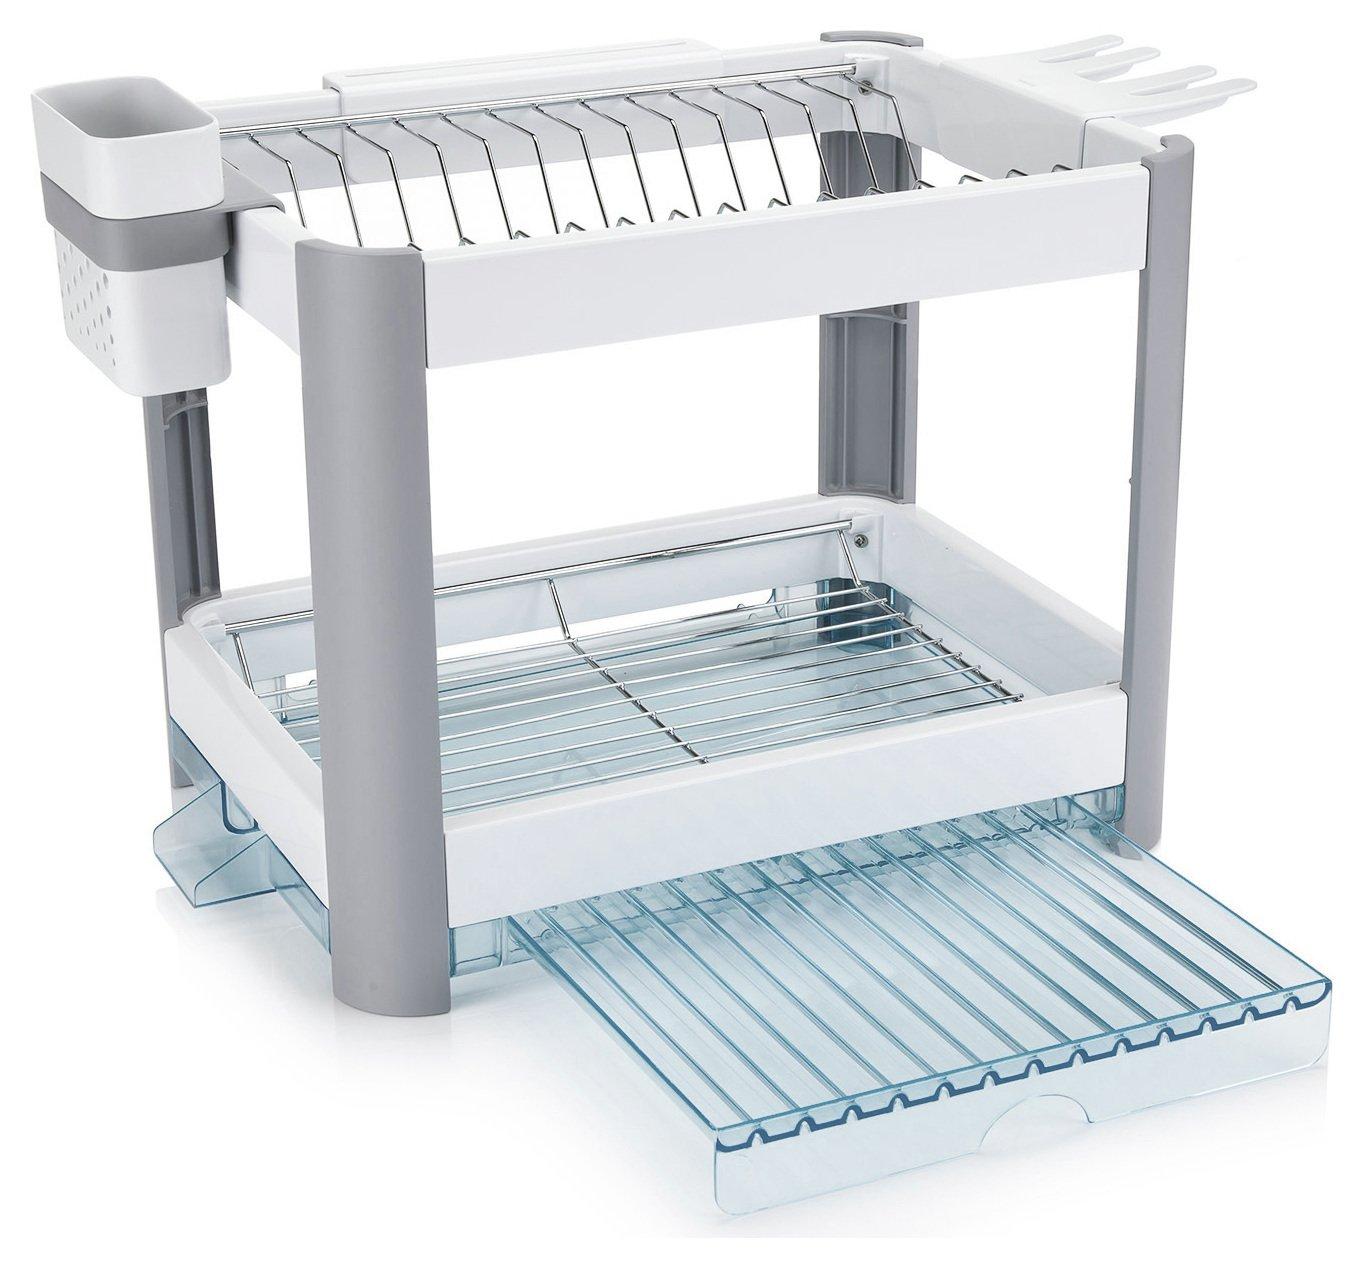 minky twin tier extending dish rack gay times uk. Black Bedroom Furniture Sets. Home Design Ideas